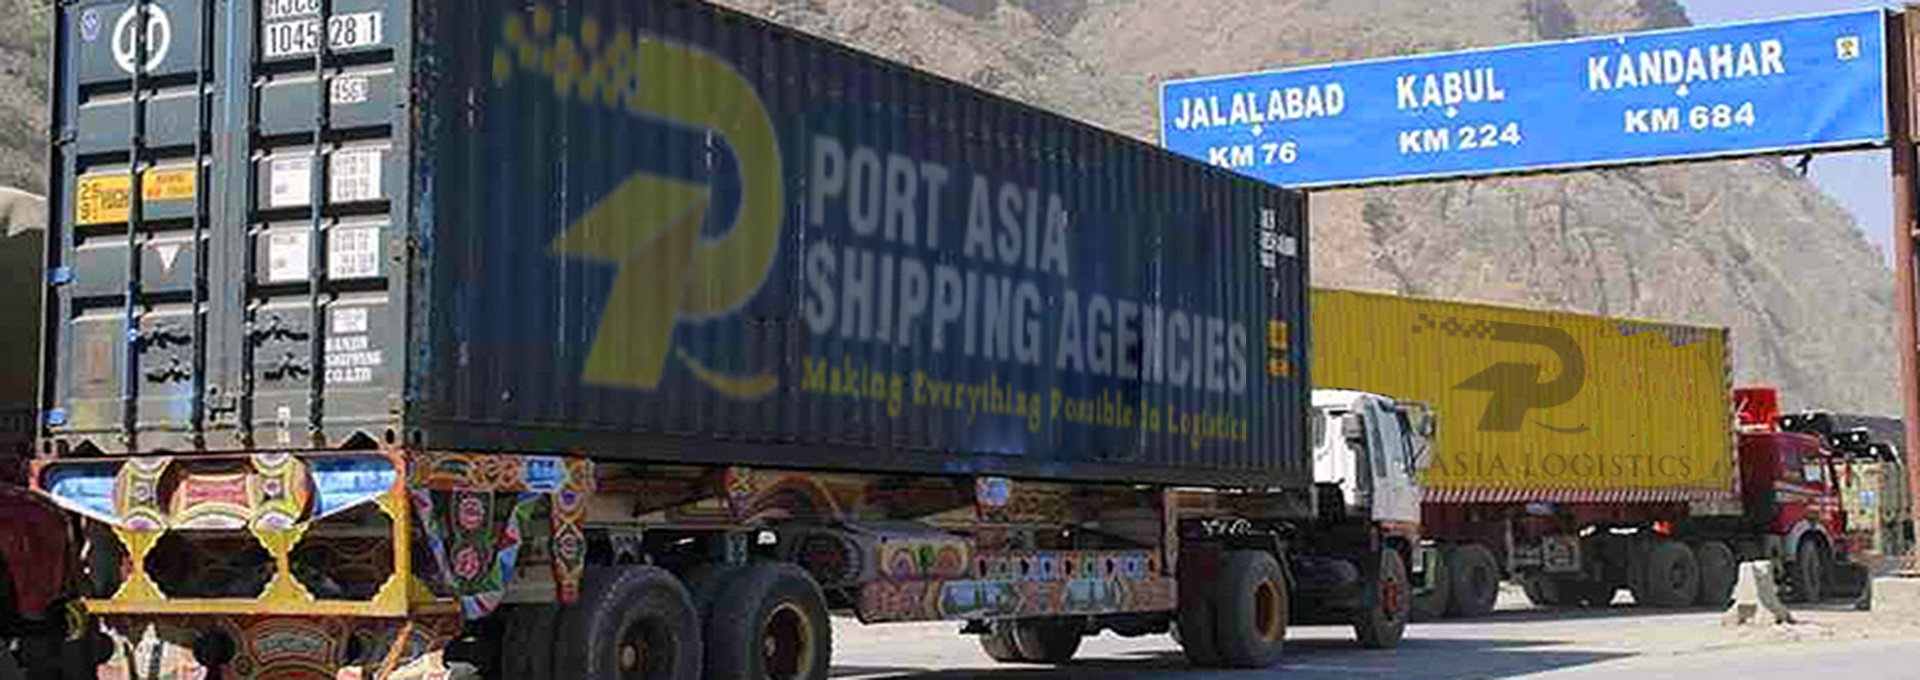 afghan-cargo